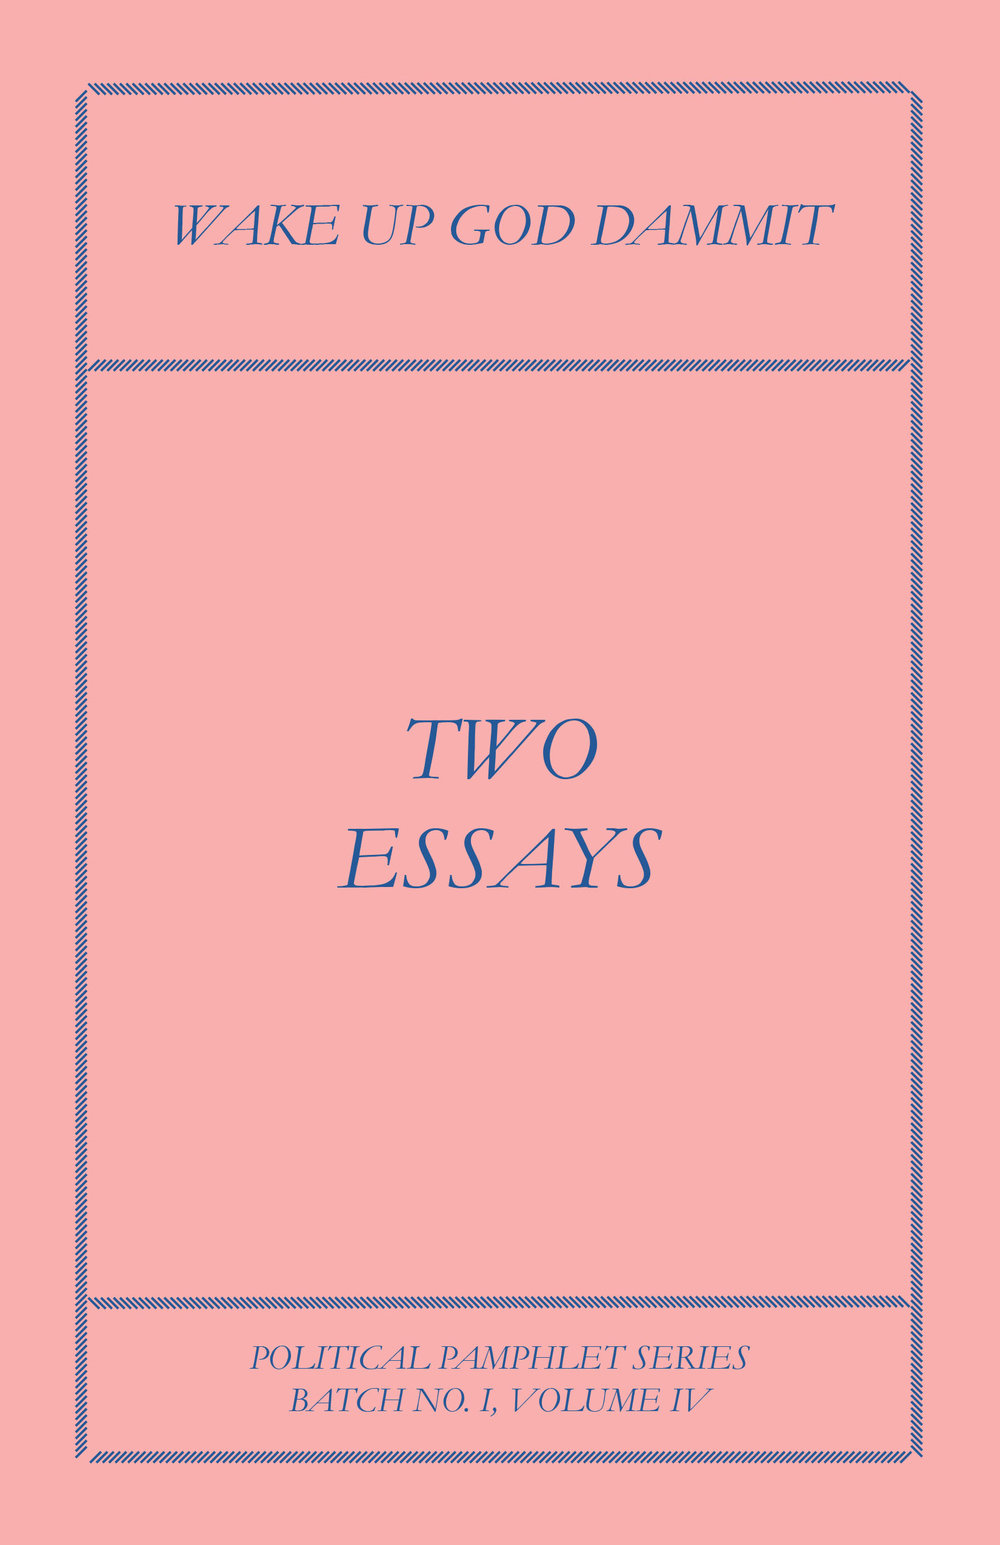 PP DAMMIT WEB.pdf-1.jpg